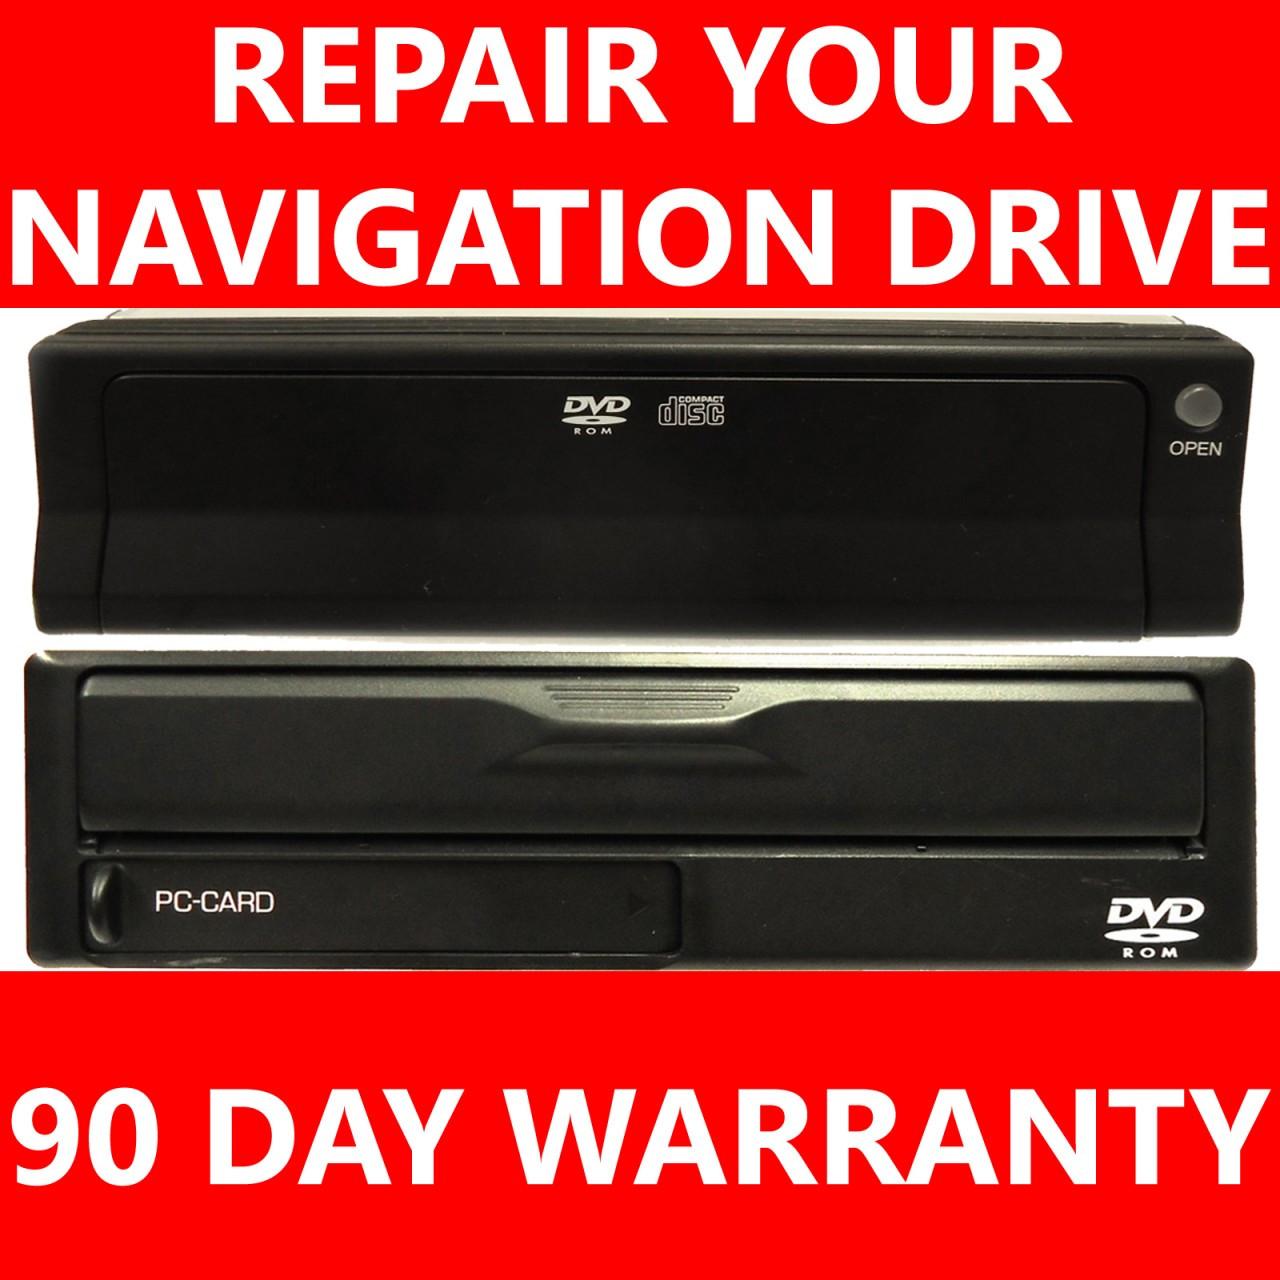 (AcNAVIR) Navigation DVD Rom Drive Repair TL RL MDX TSX 03